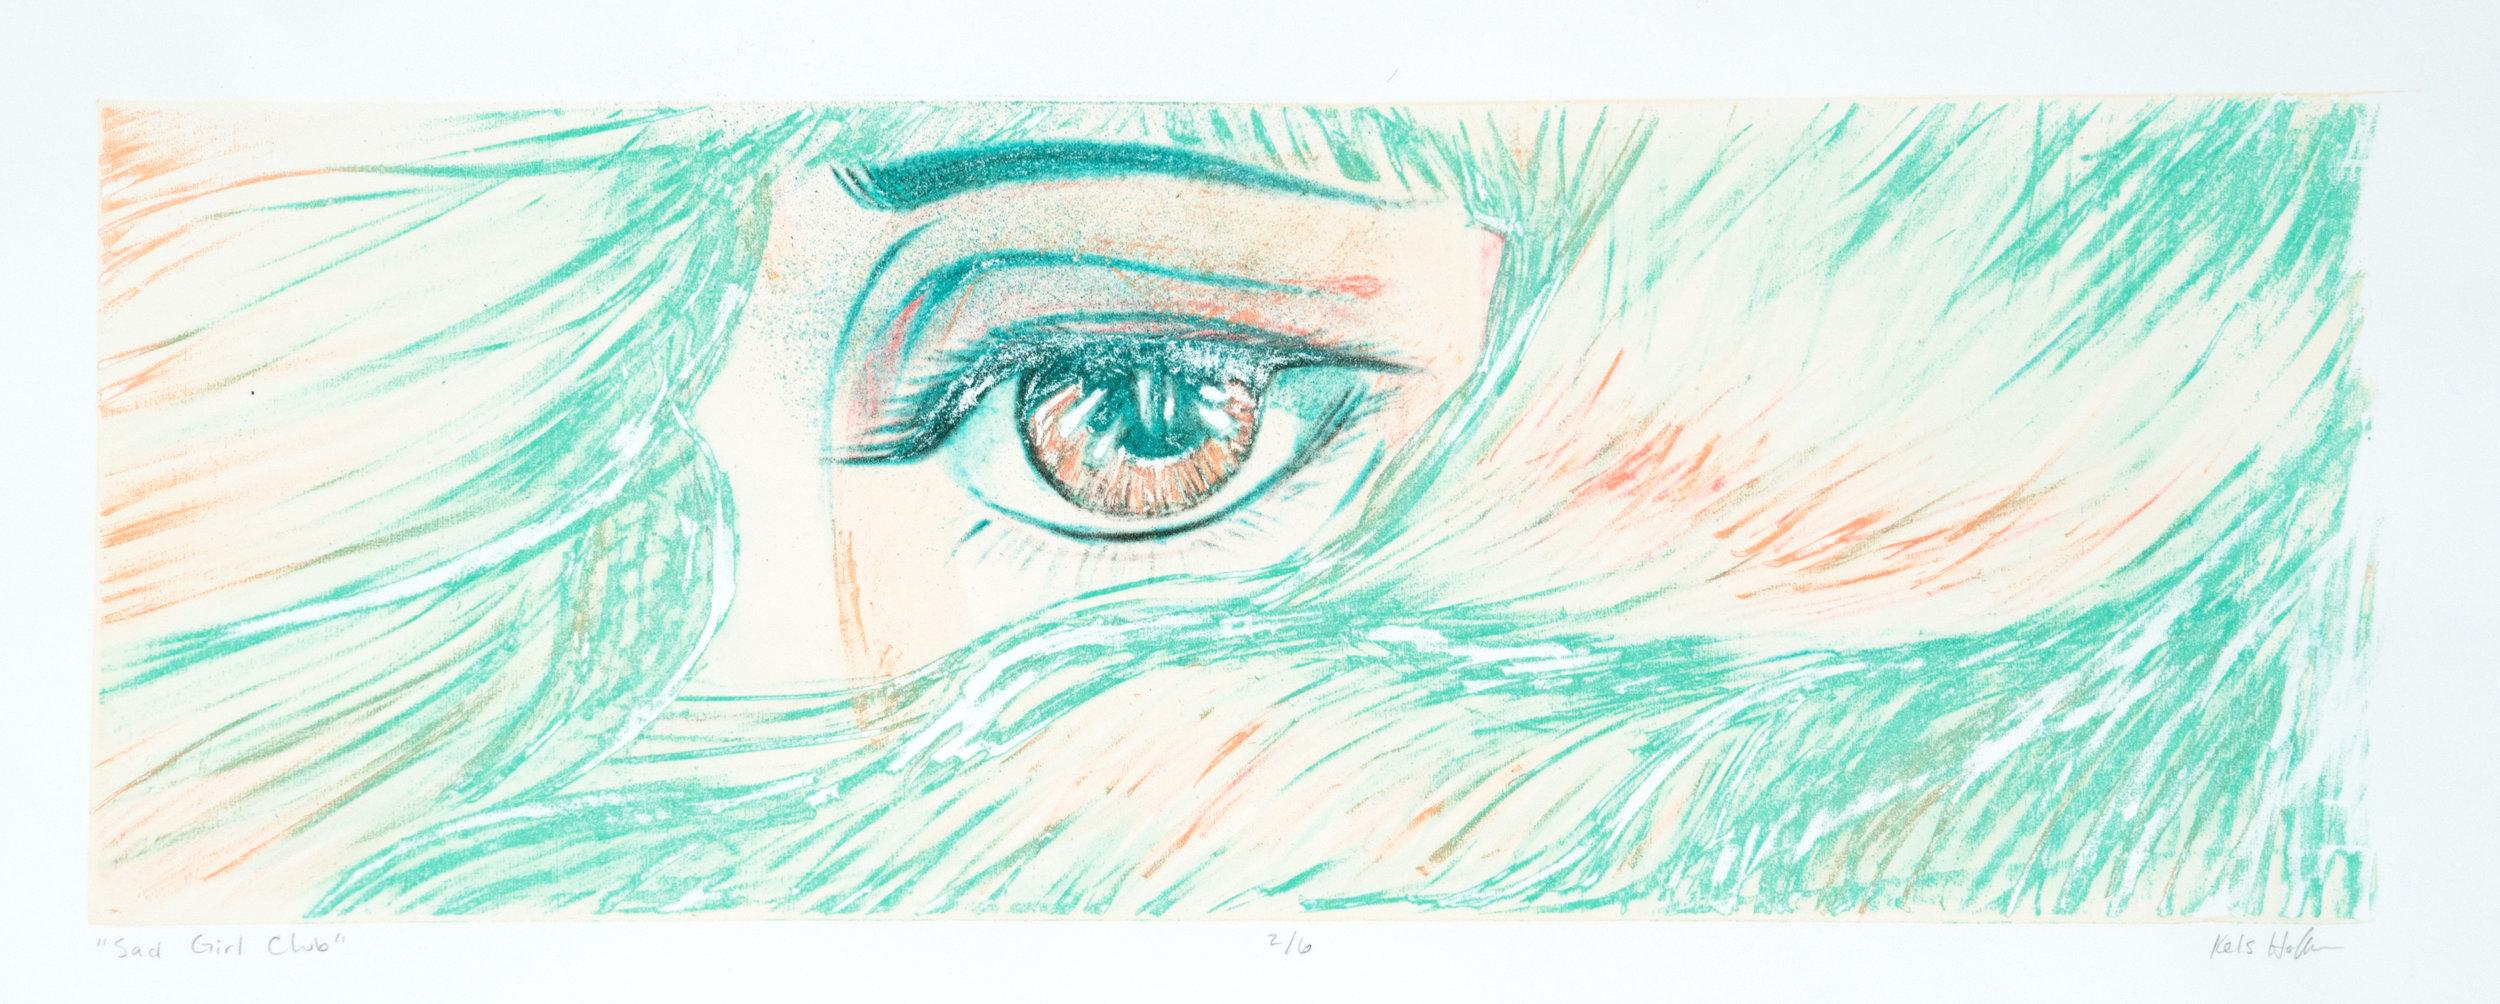 screenprint-sad girl eyes 2.jpg